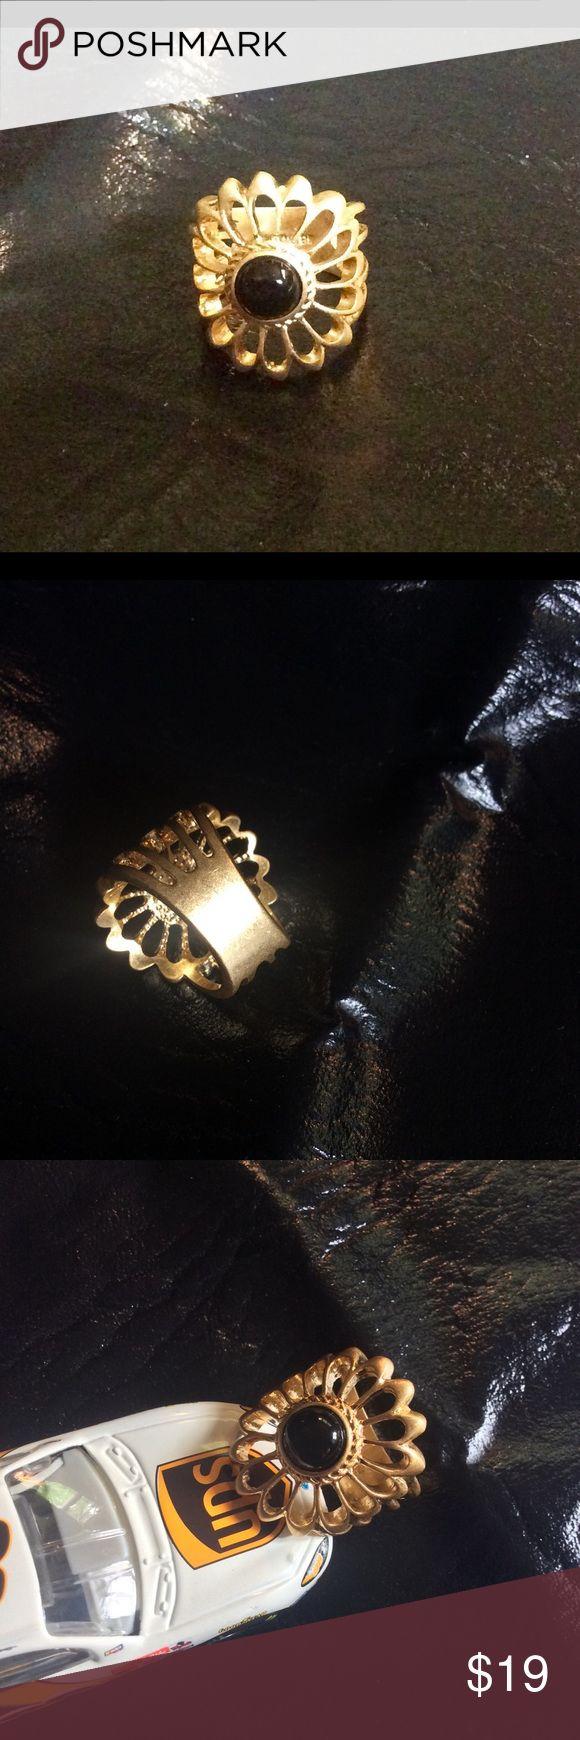 Goldtone Flower ring w/ Black Stone Brushed goldtone in a